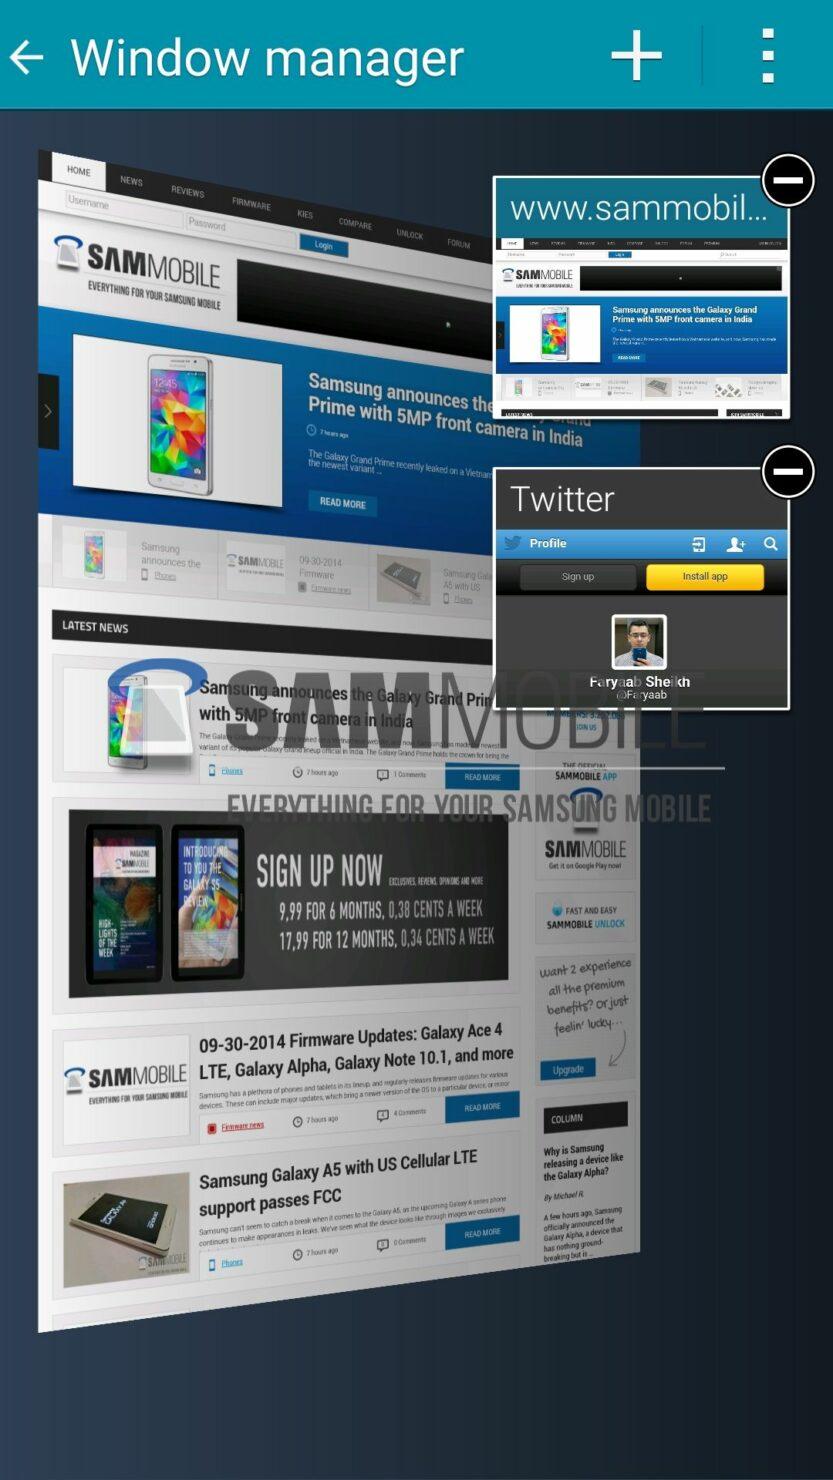 samsung-galaxy-s5-running-android-lollipop-9